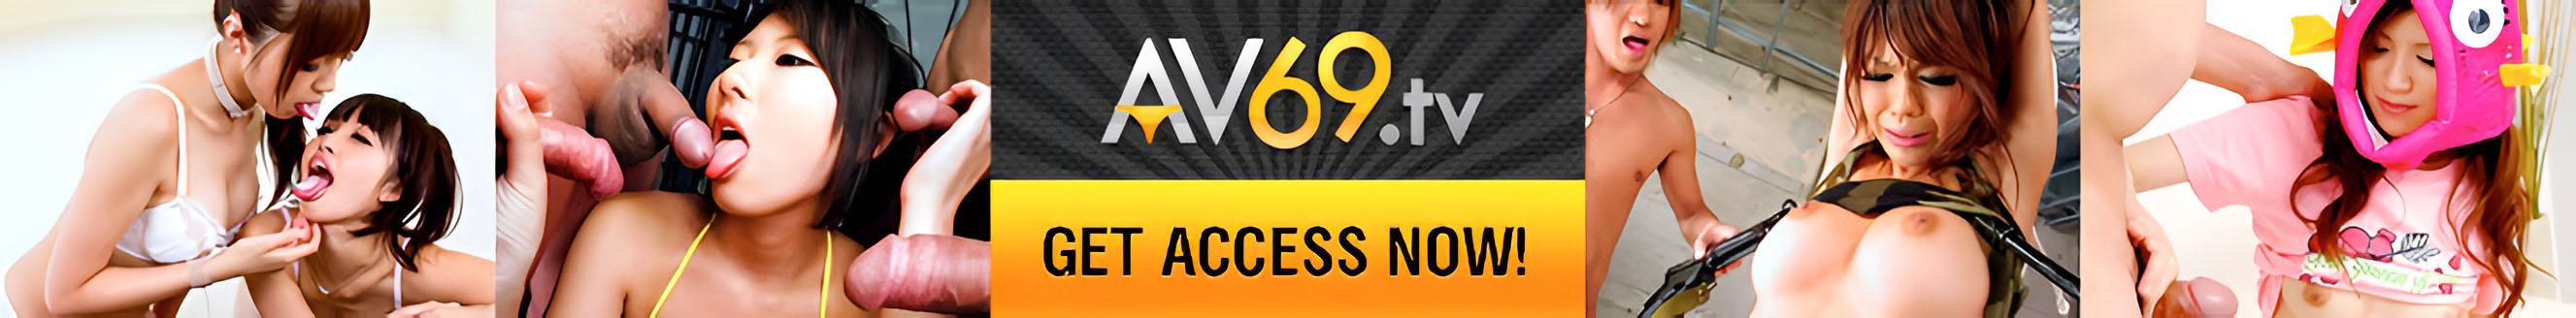 Download this from AV69